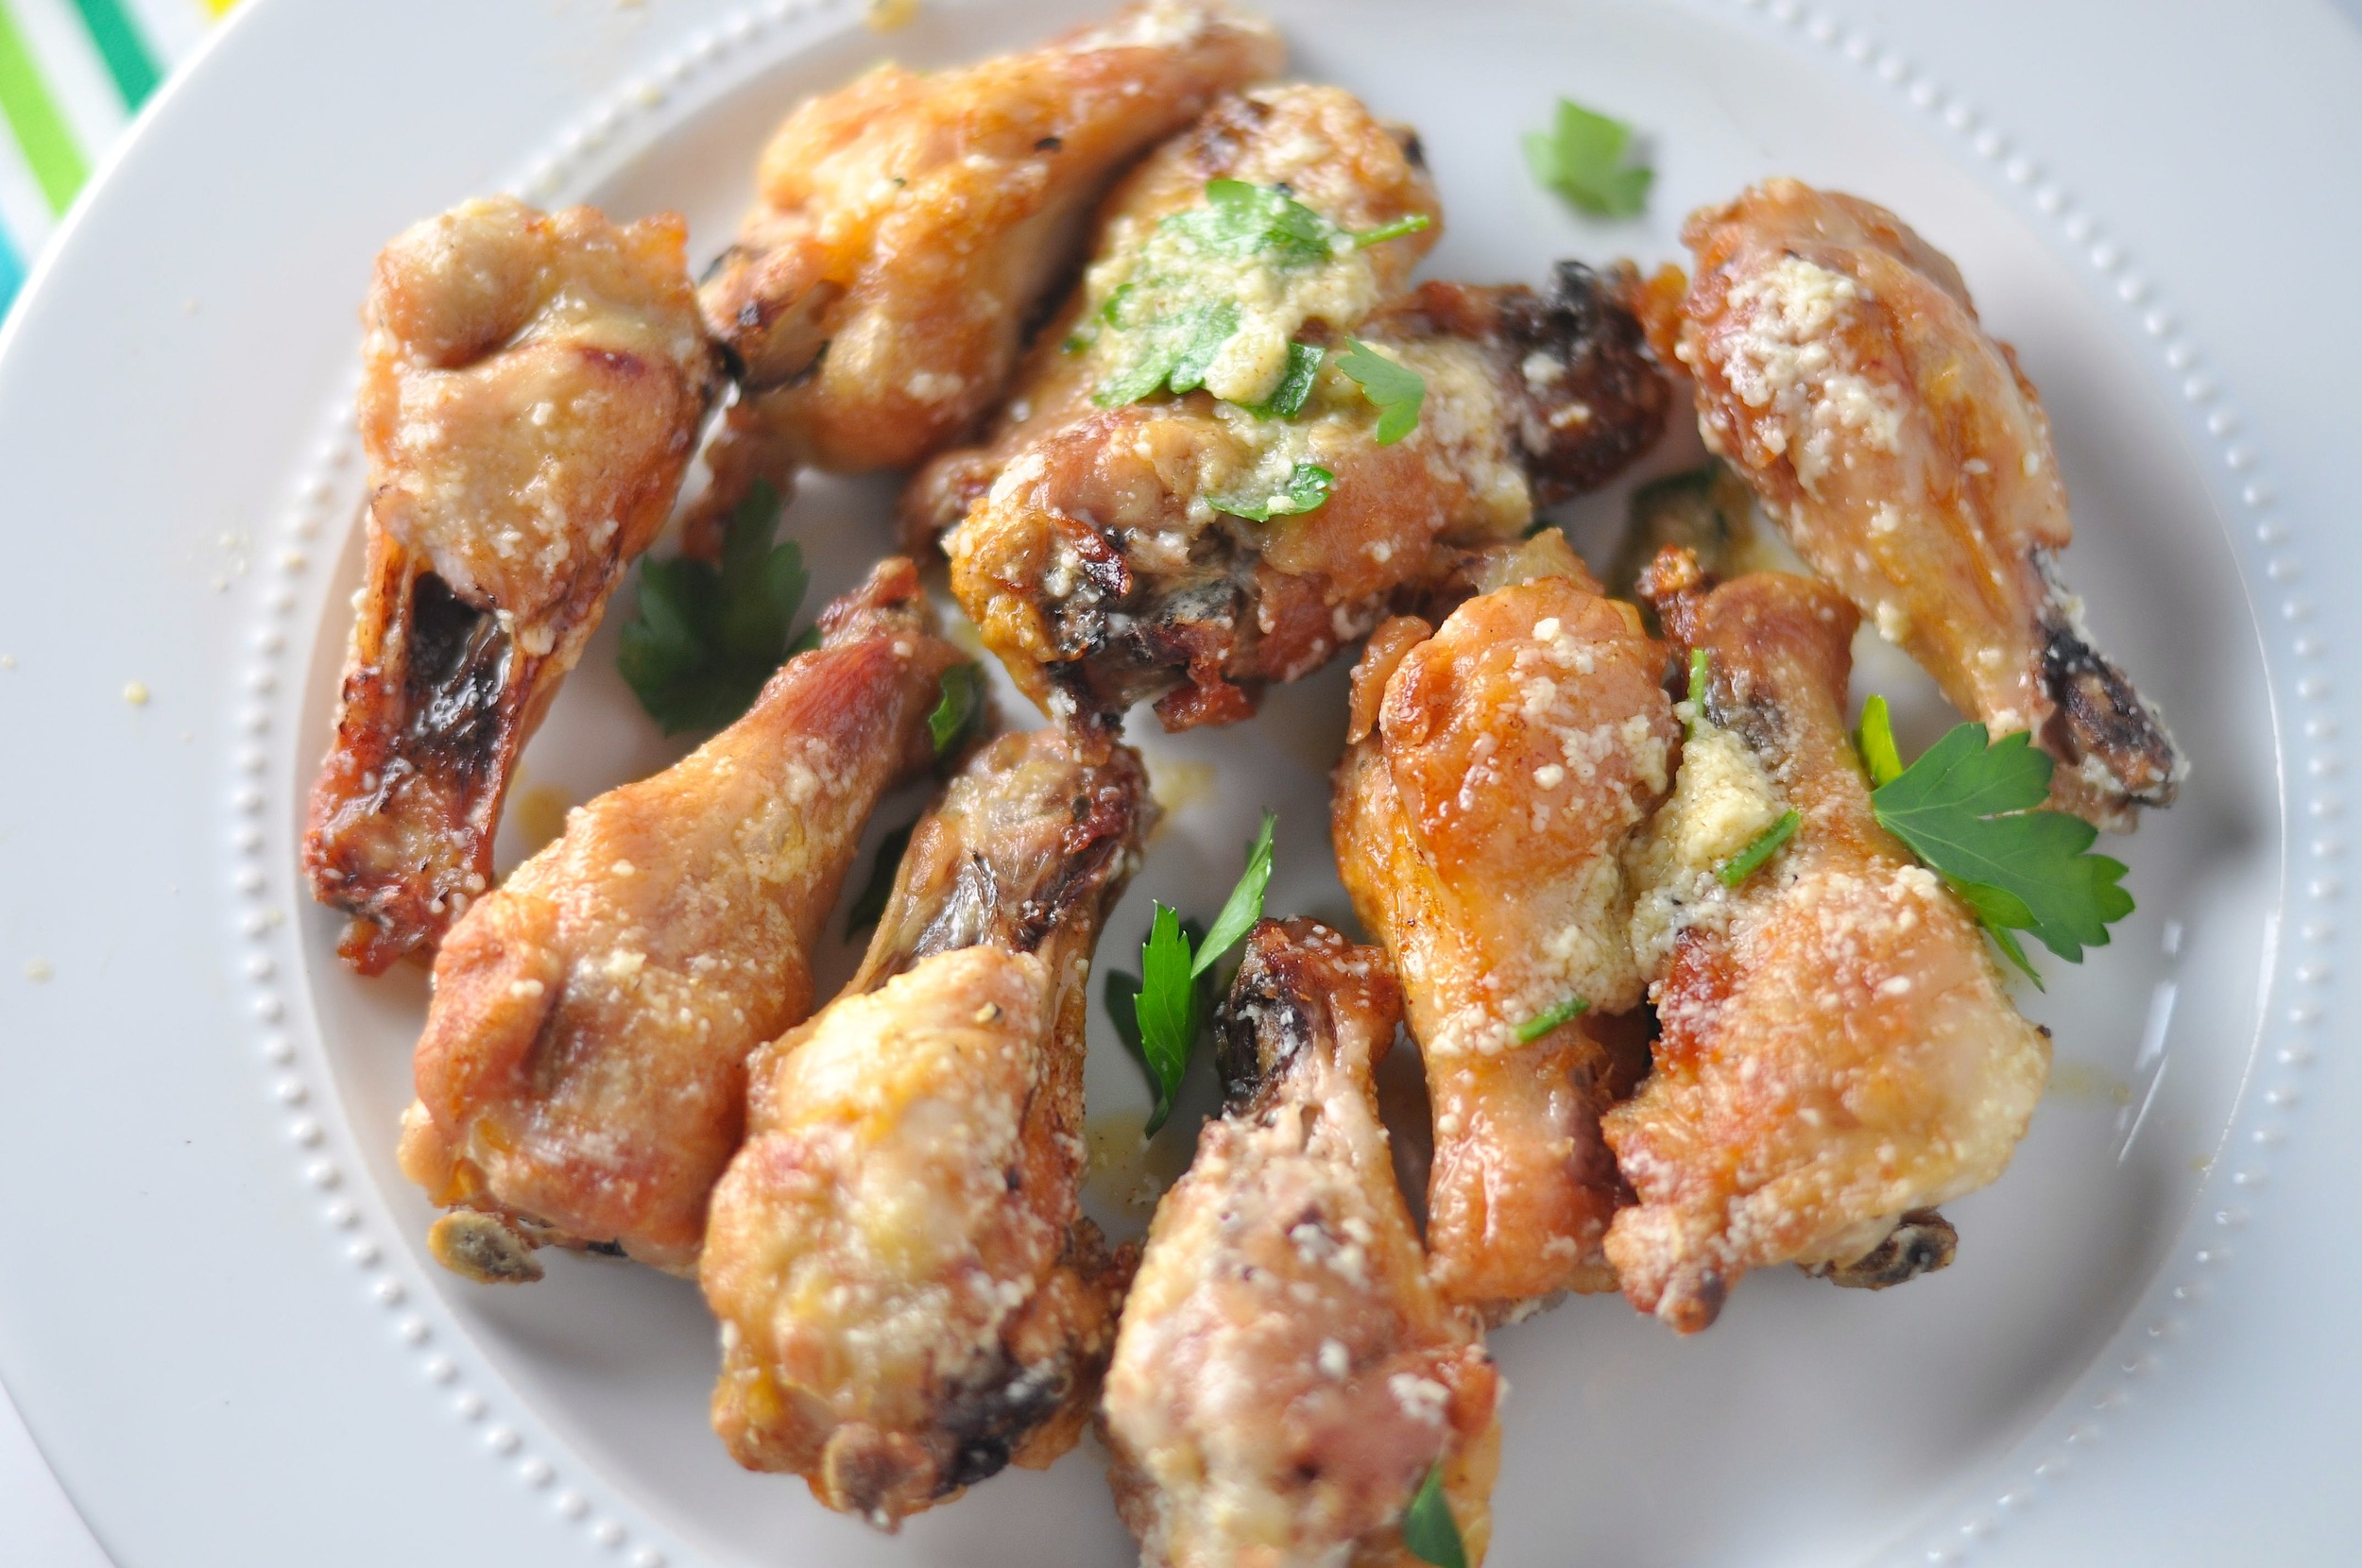 garlic cheese wings